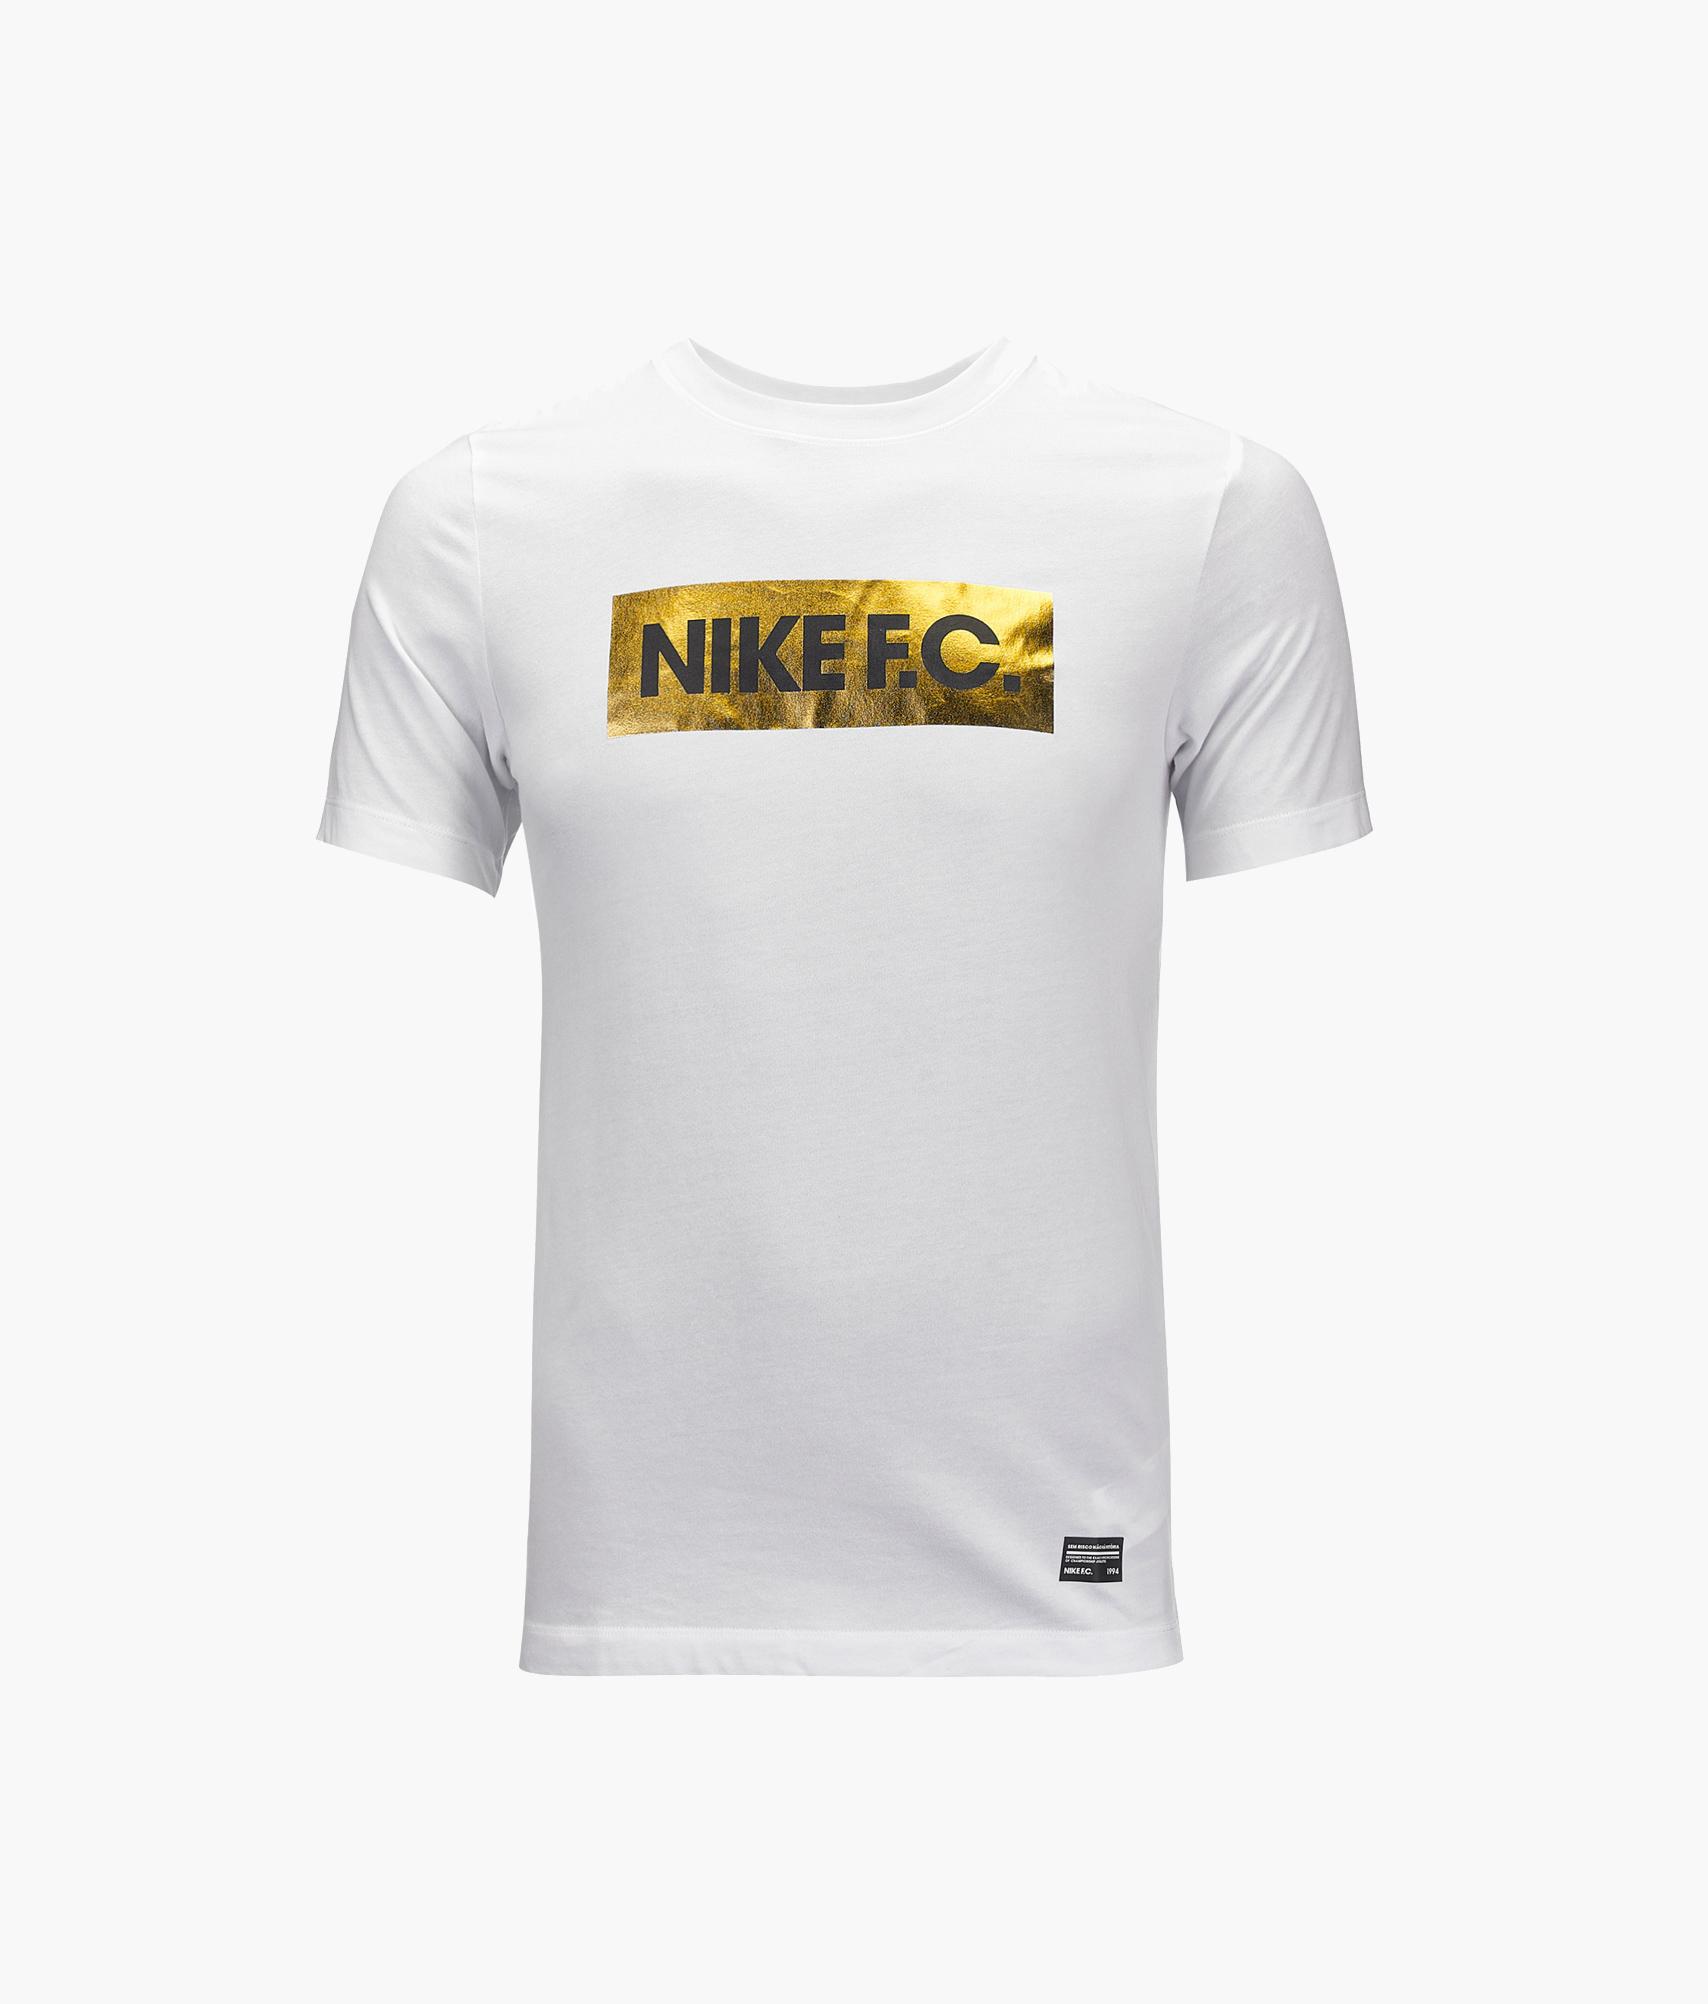 Футболка Nike «Чемпион-2018/19» Nike Цвет-Белый реплика выездной игровой футболки nike 2018 19 nike цвет белый